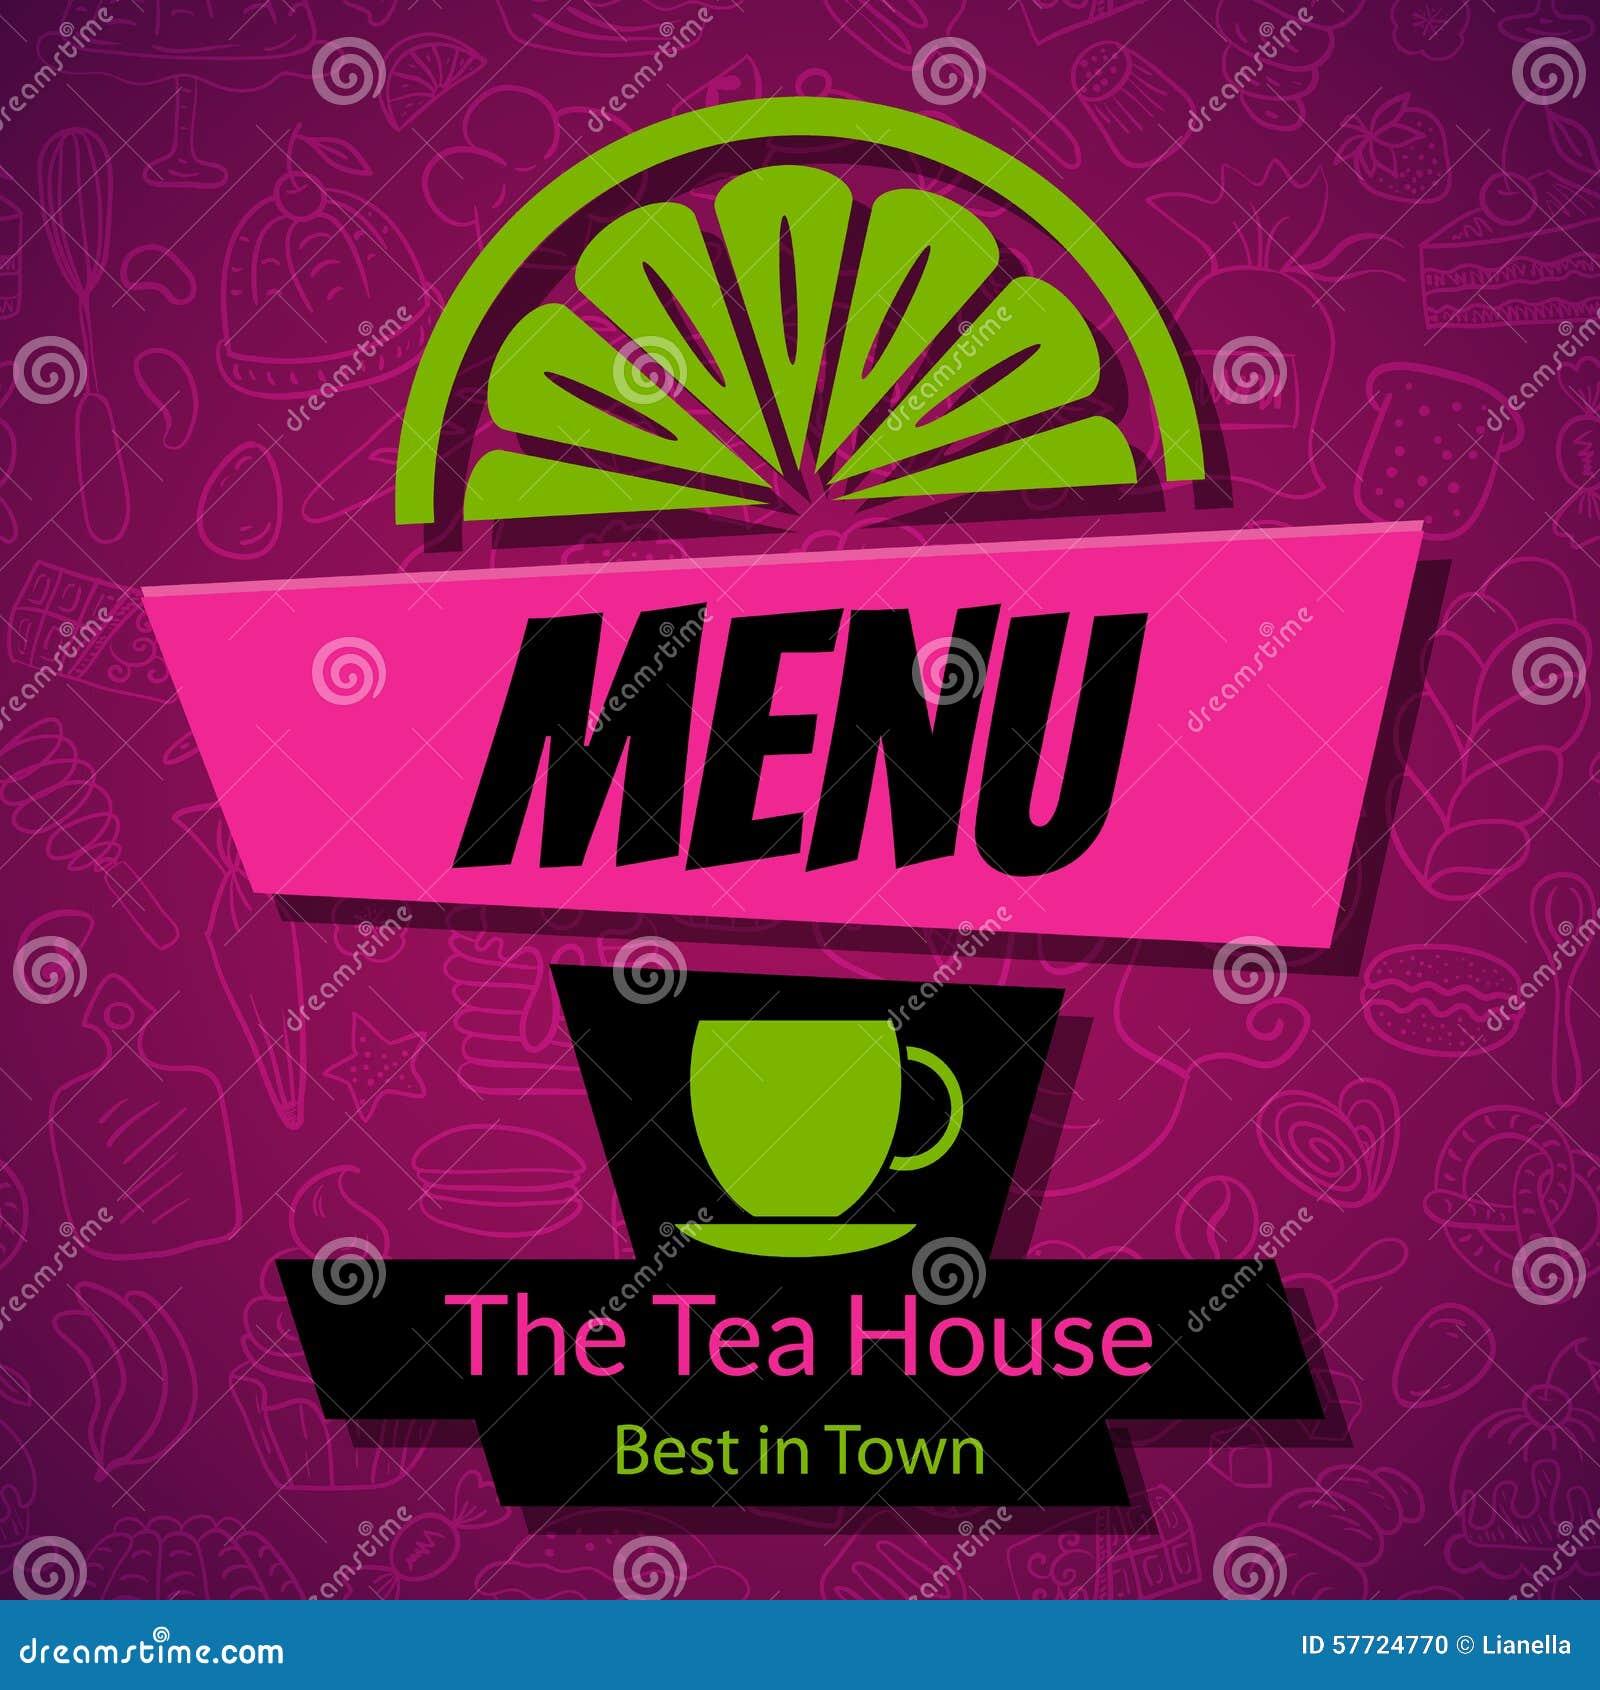 modern tea house menu card design template stock vector - image